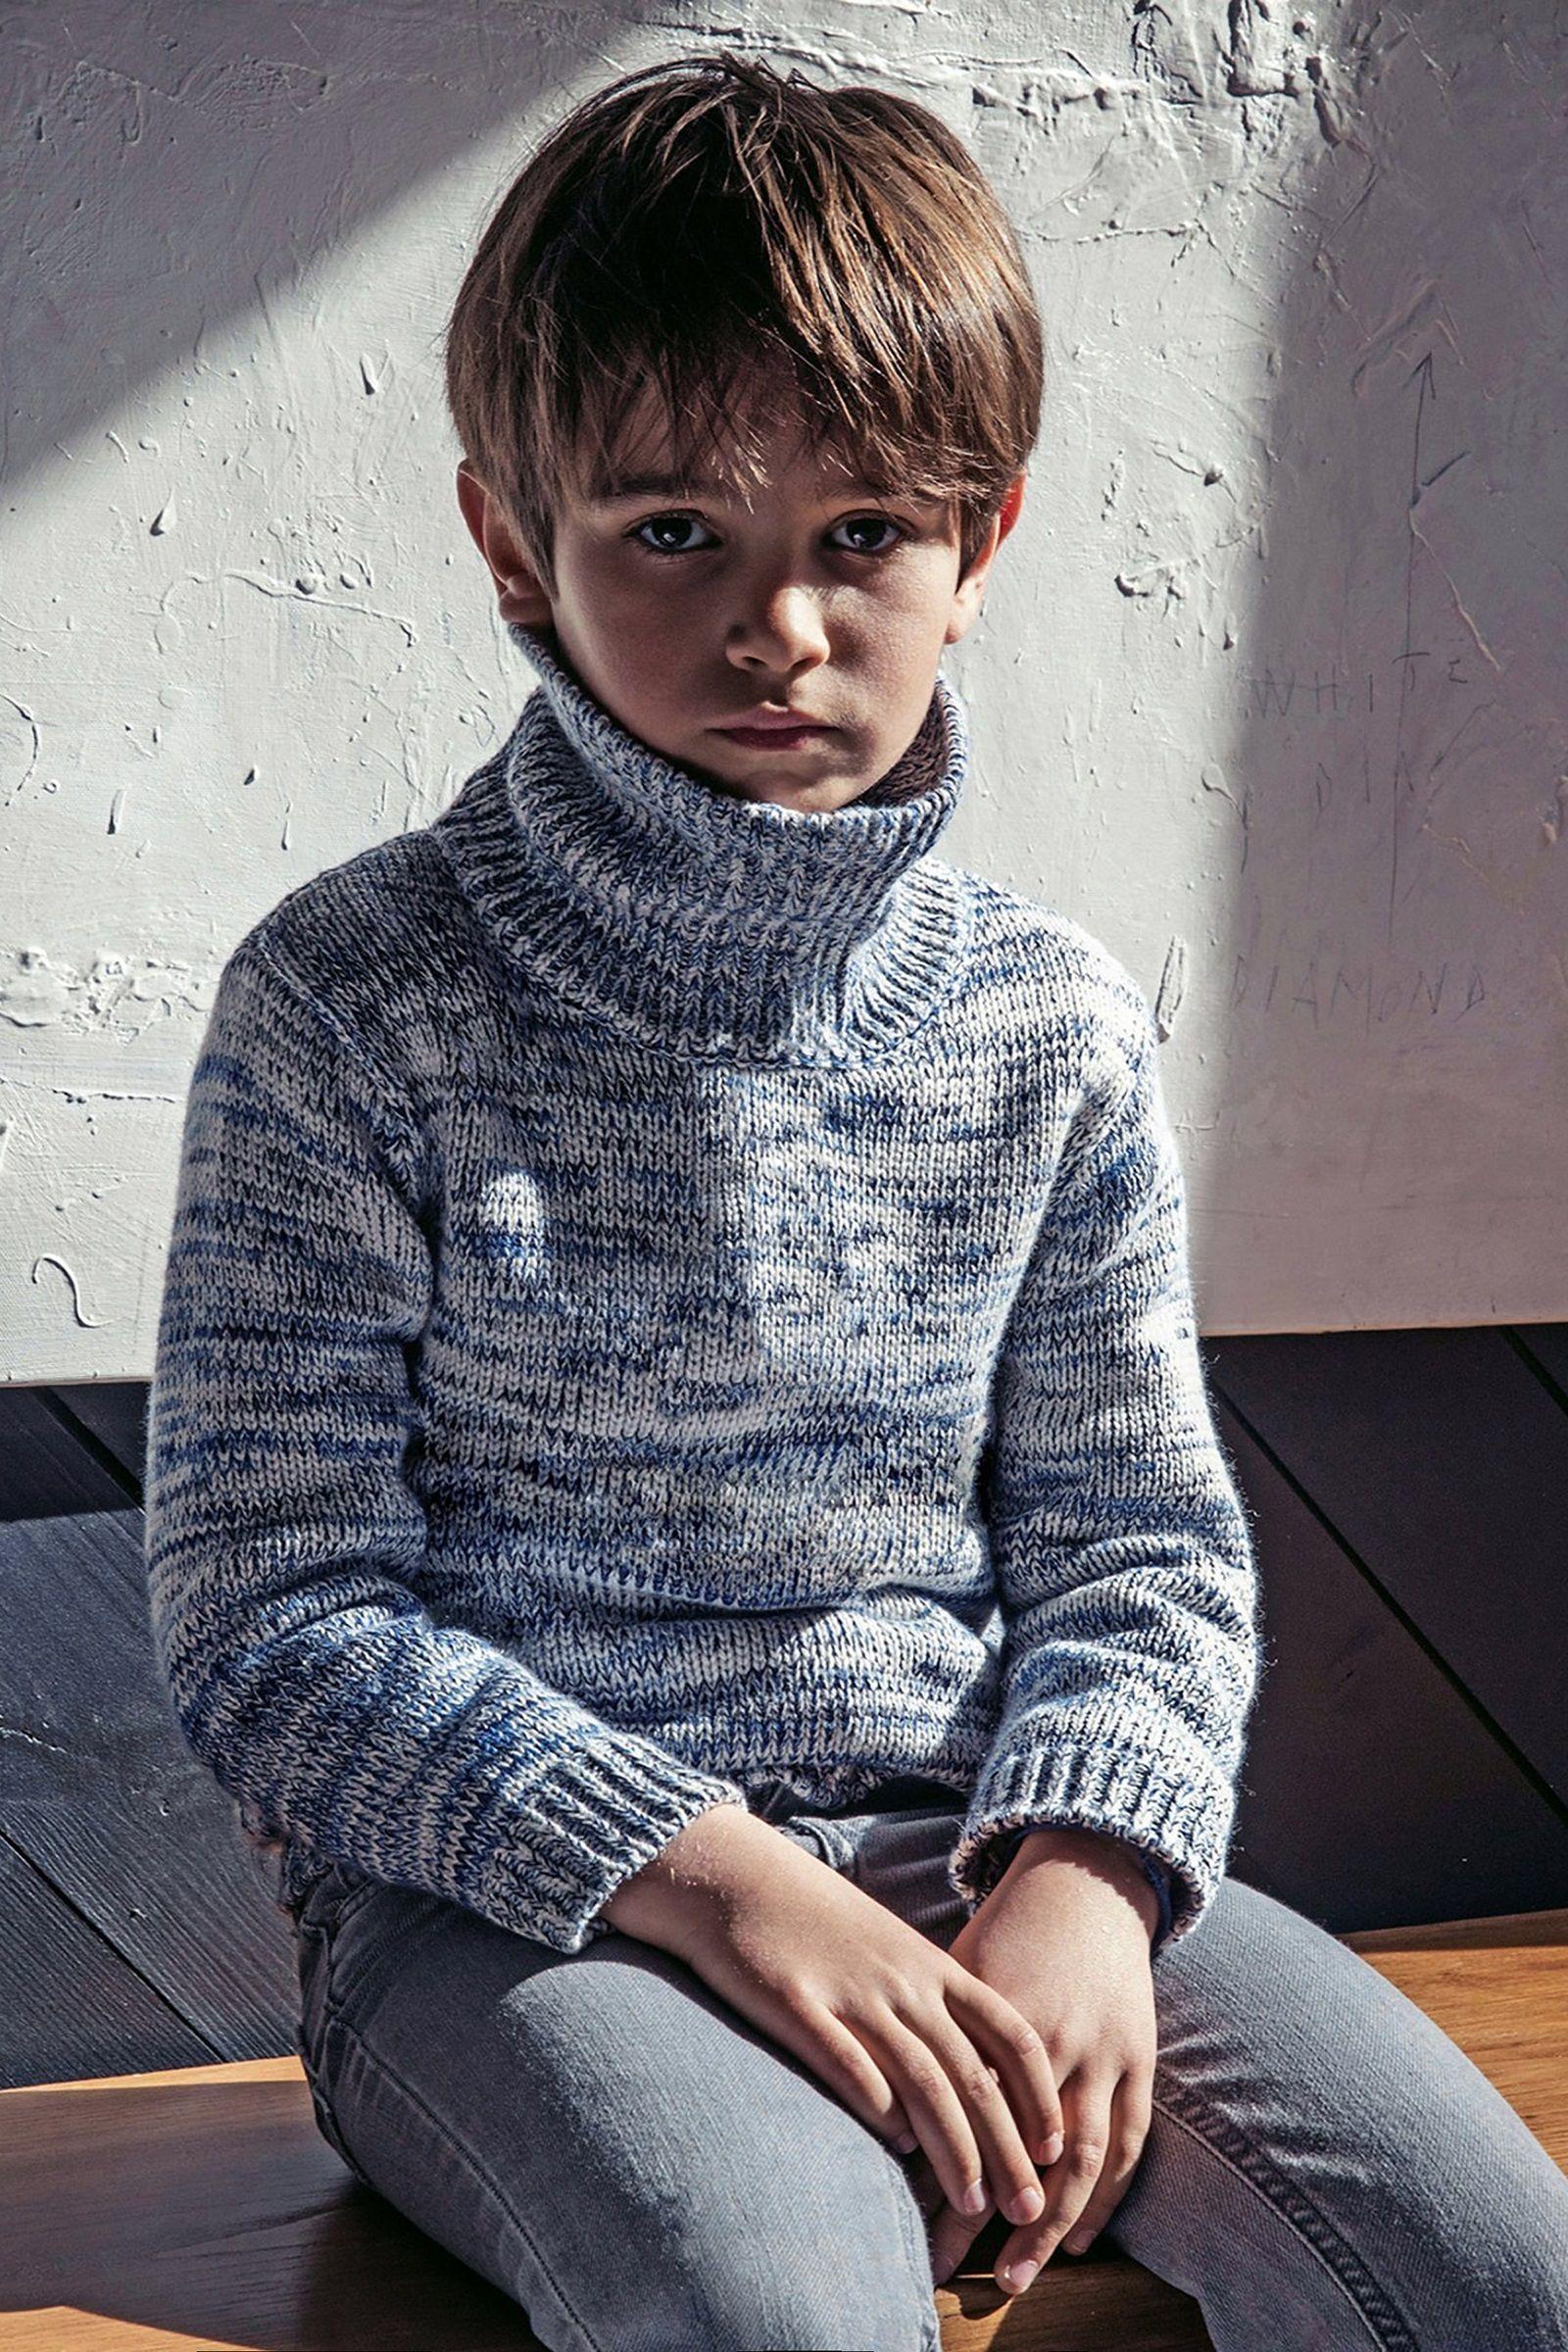 boys kids merino alpaca turtleneck sweater, photo from